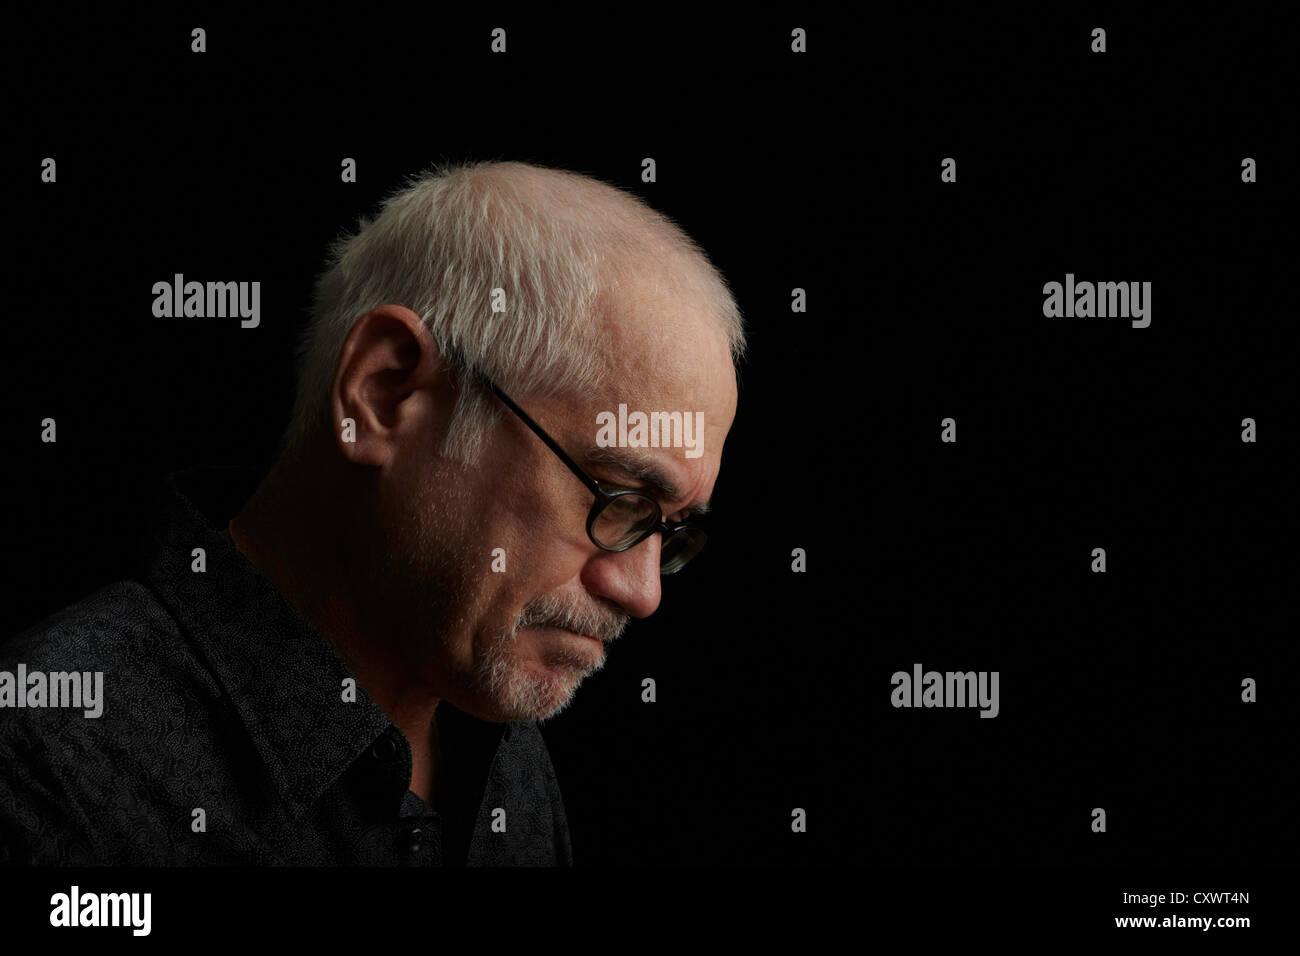 Fronçant older man wearing eyeglasses Photo Stock